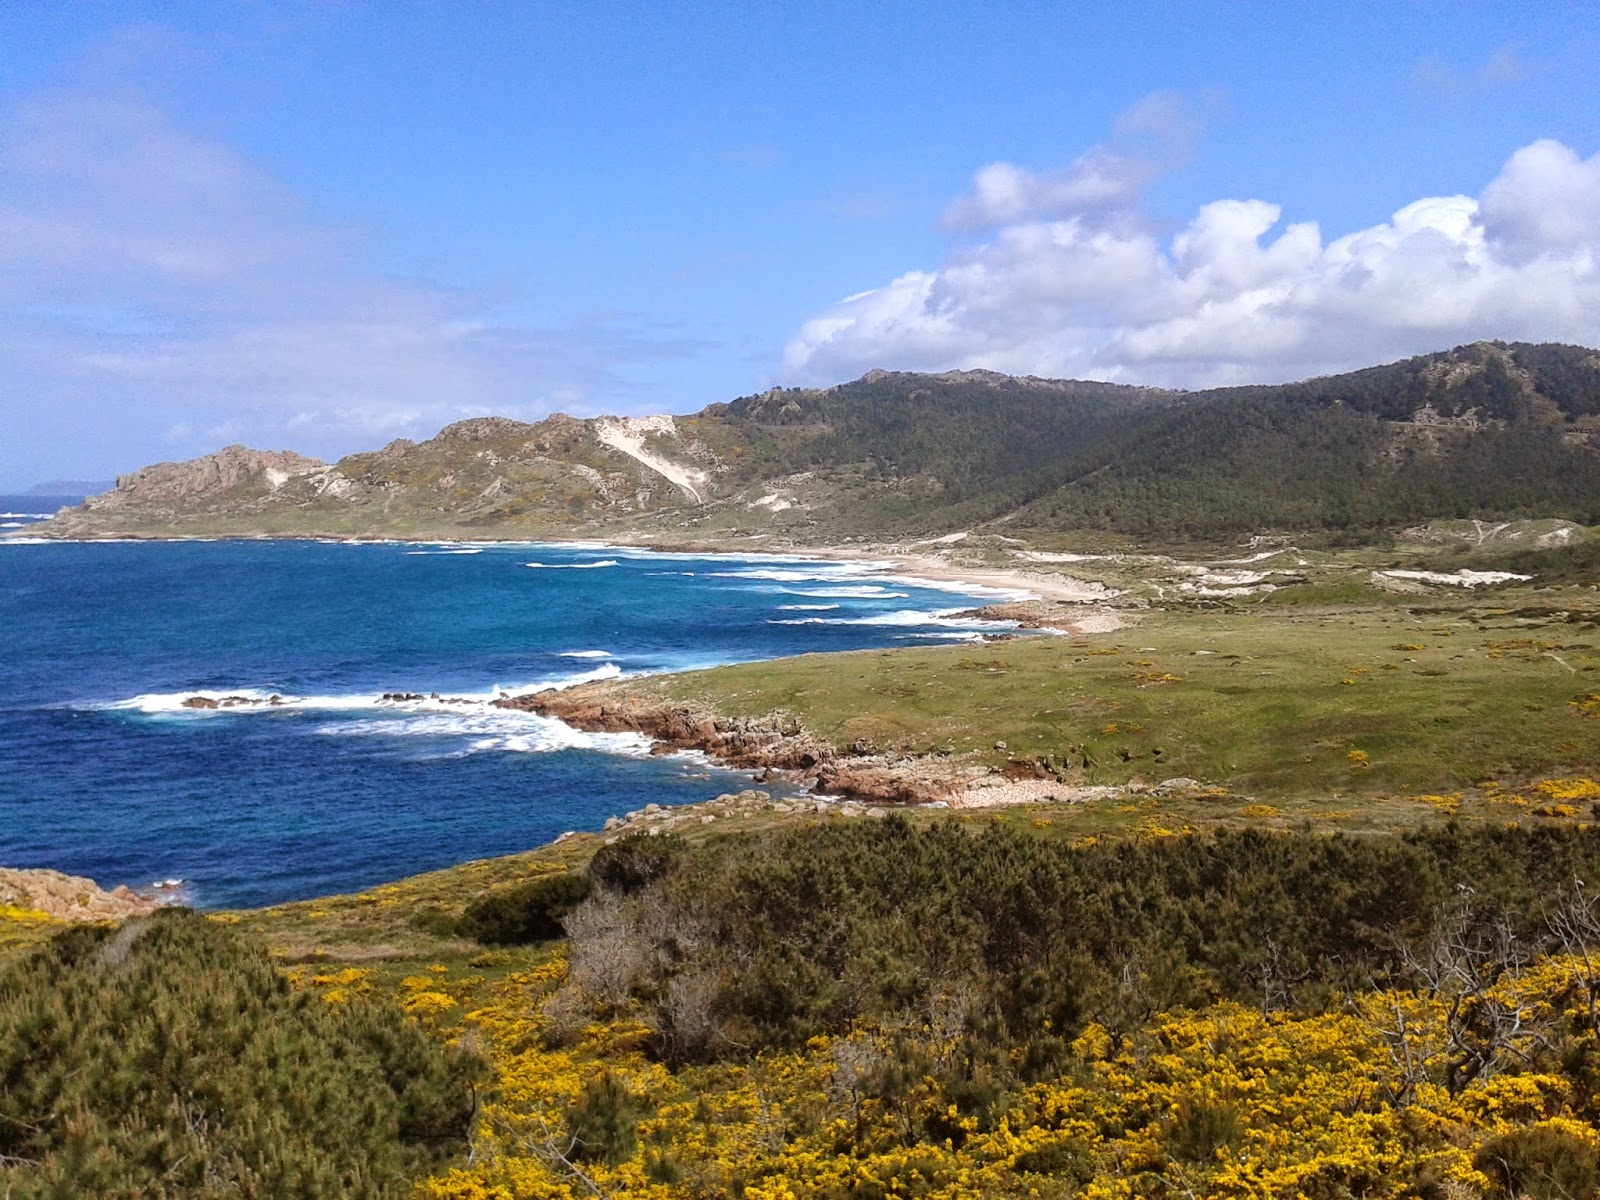 Playa de Trece en Camariñas